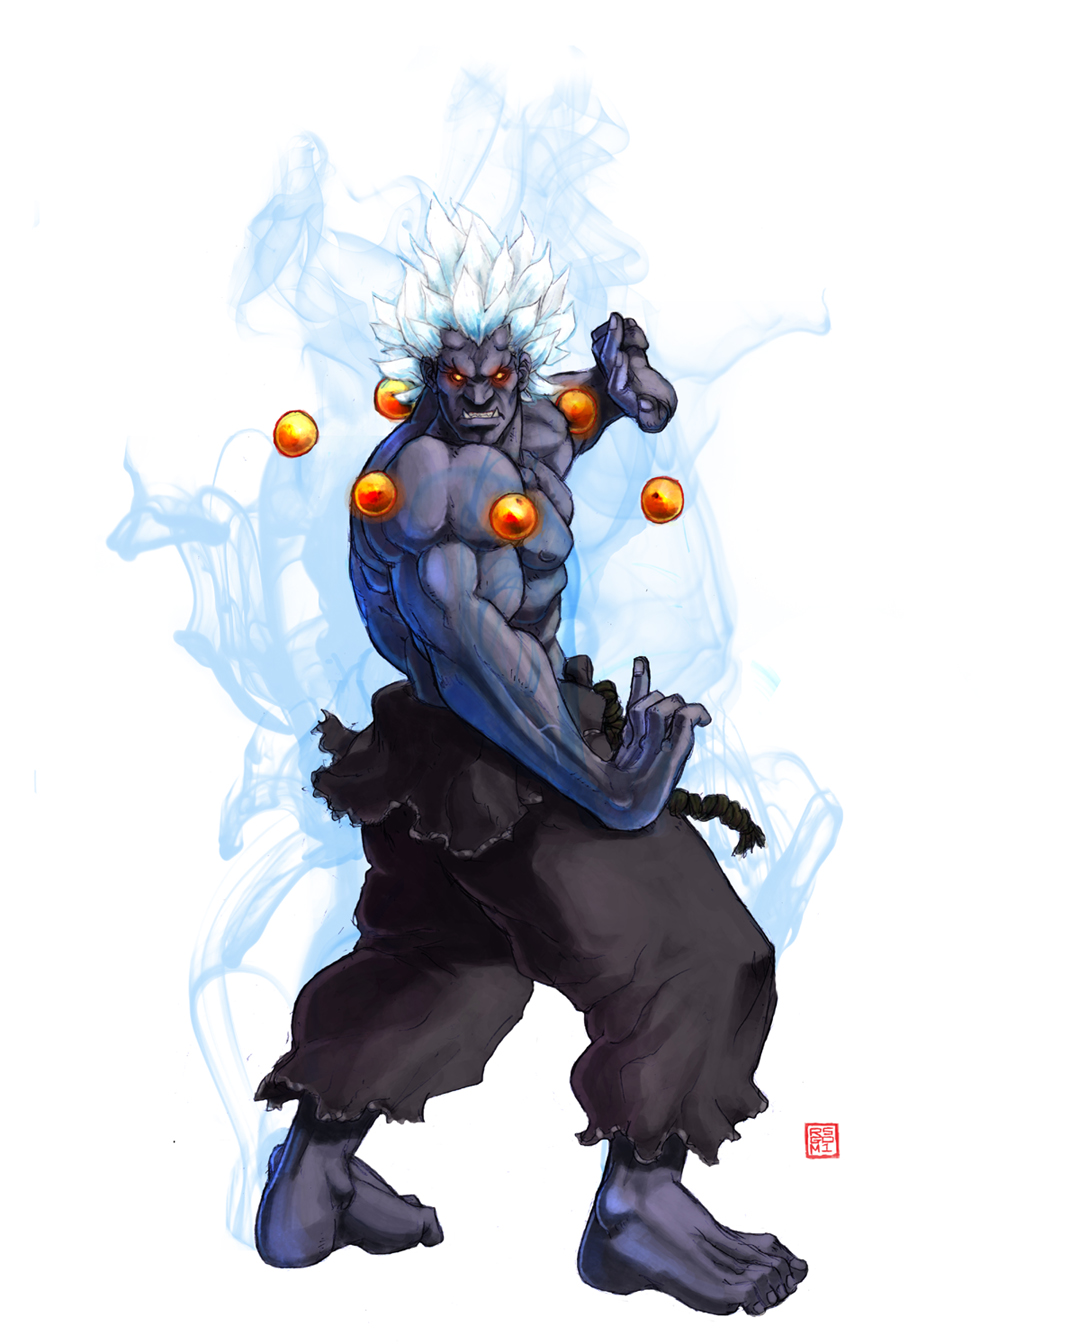 Anime Characters Fight Wiki : Oni street fighter zerochan anime image board